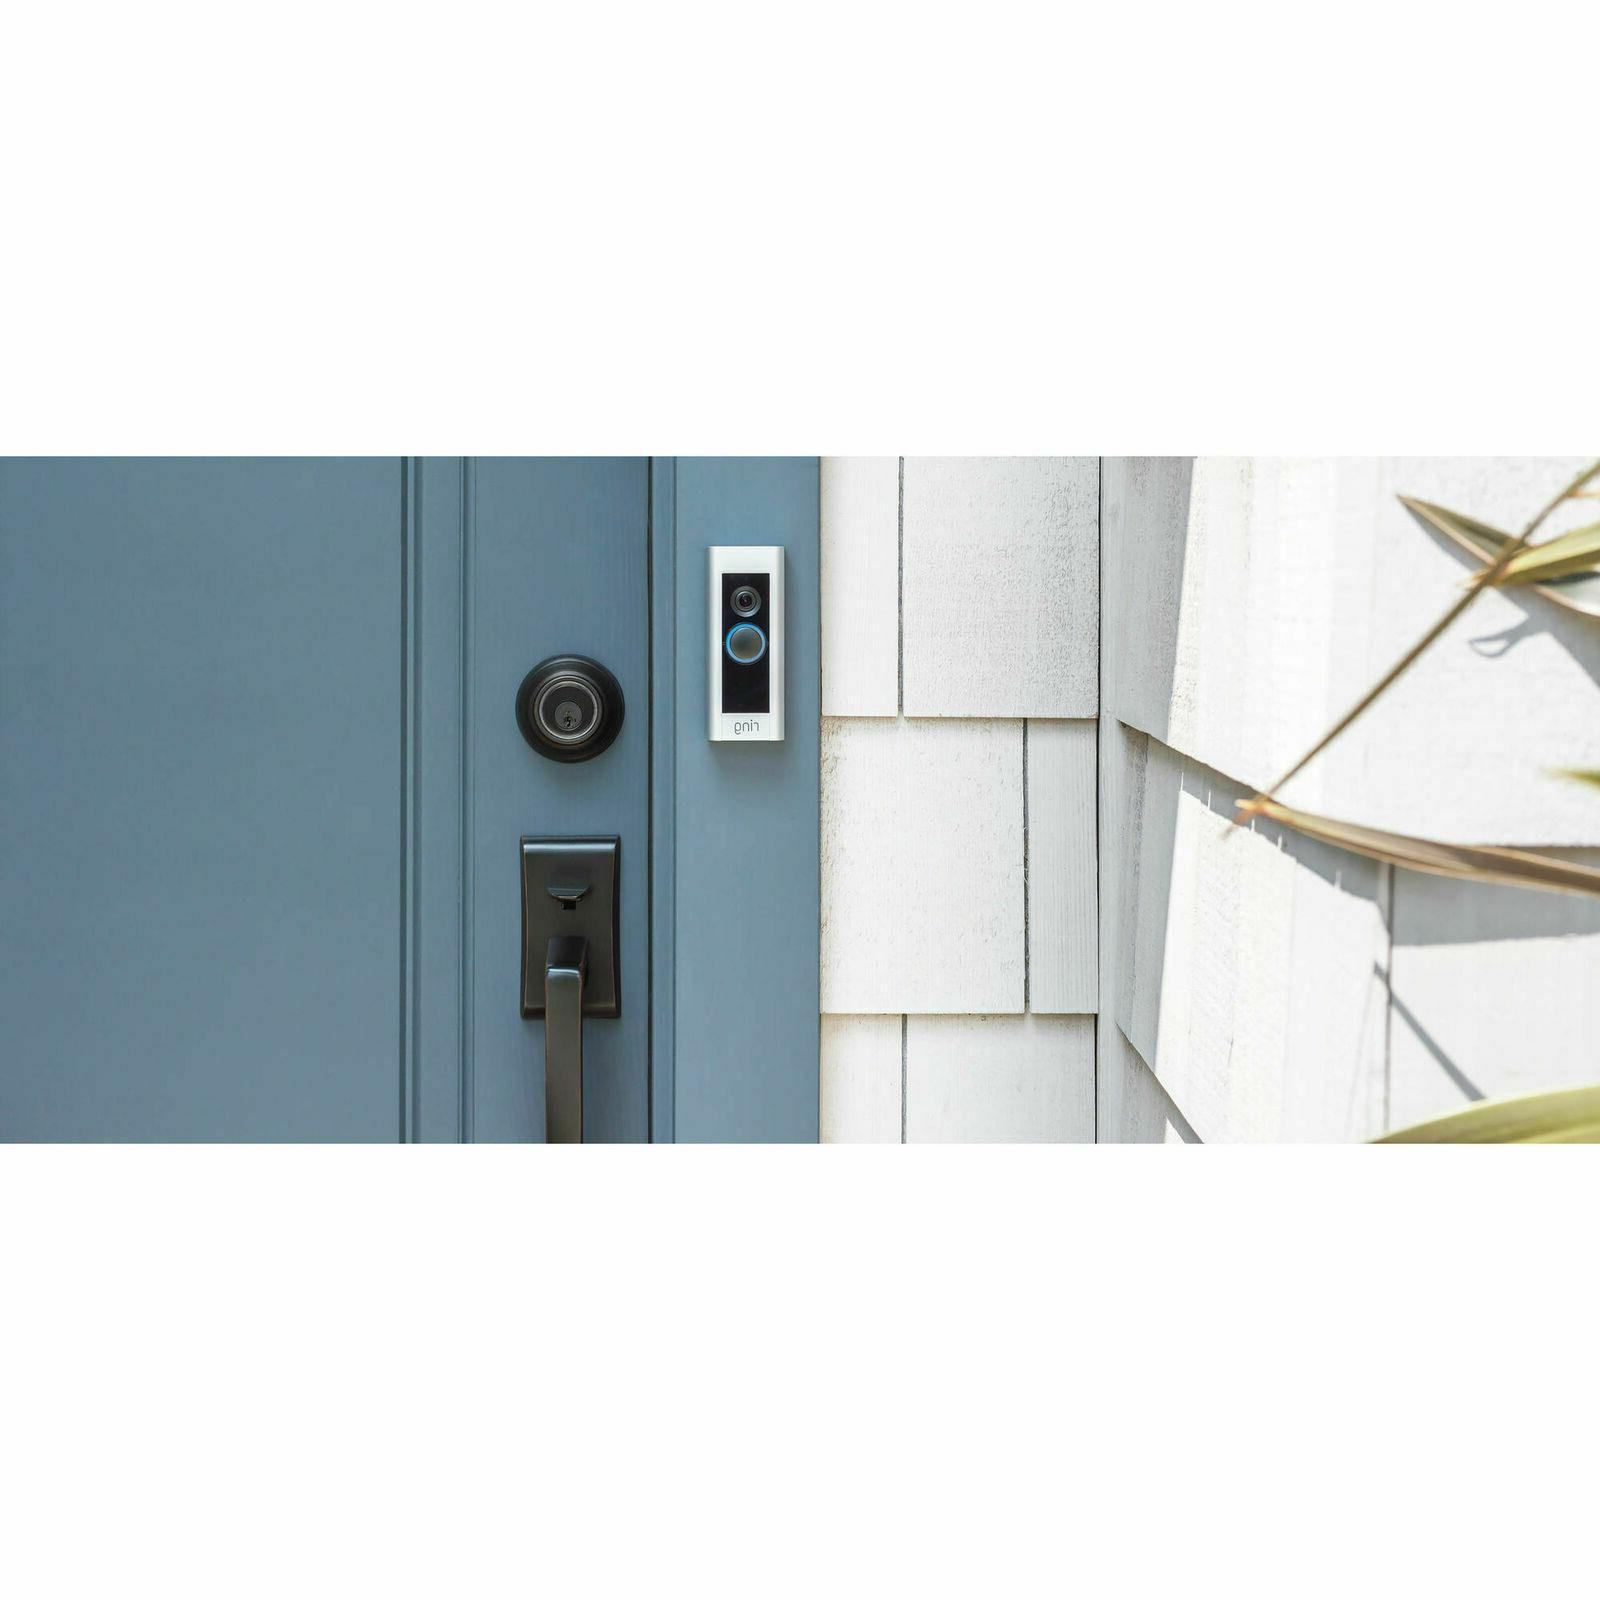 Ring Doorbell Pro 1080p HD Wi-Fi Night Vision